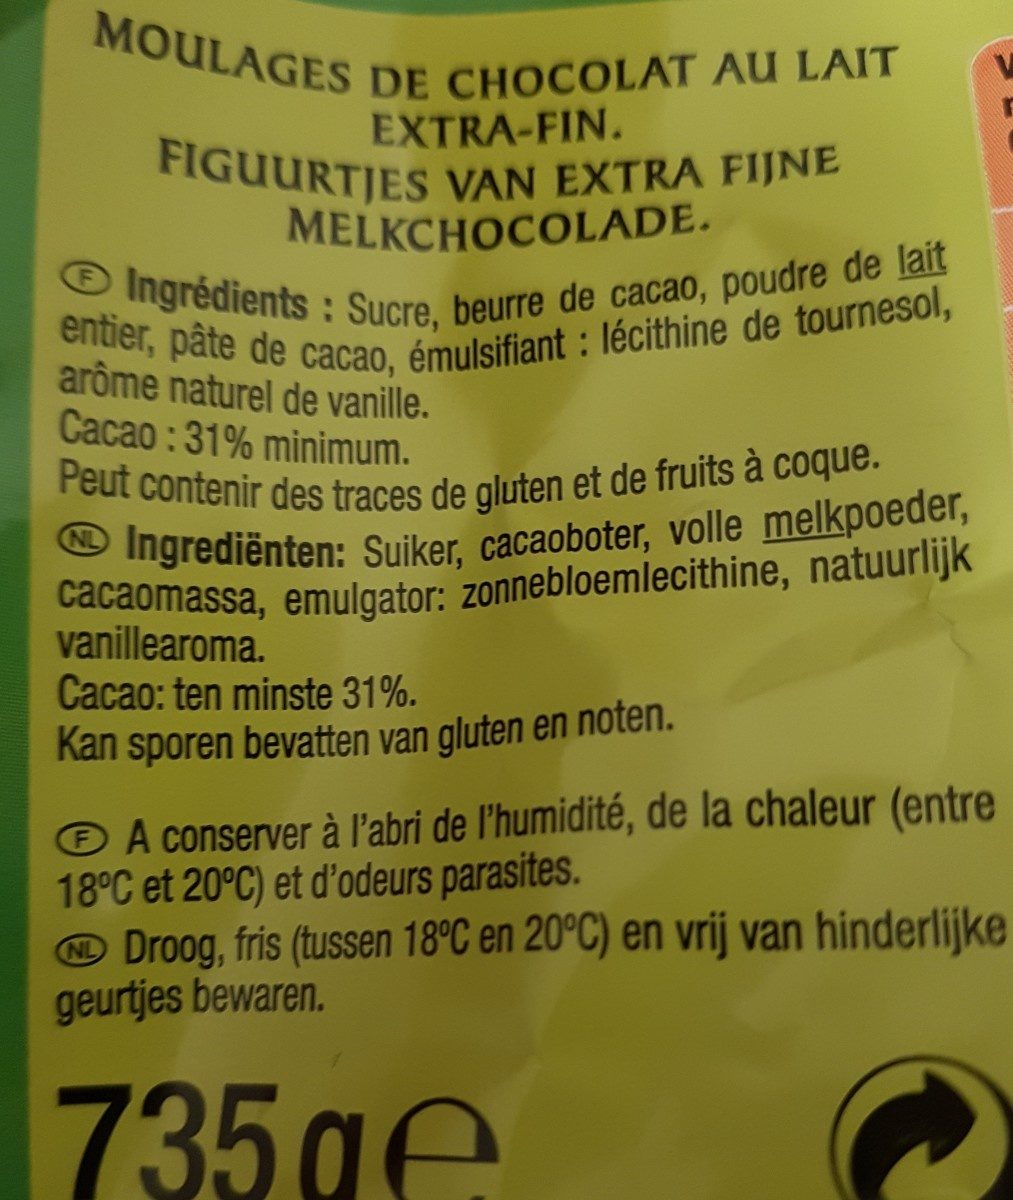 Œufs a cacher - Ingredients - fr